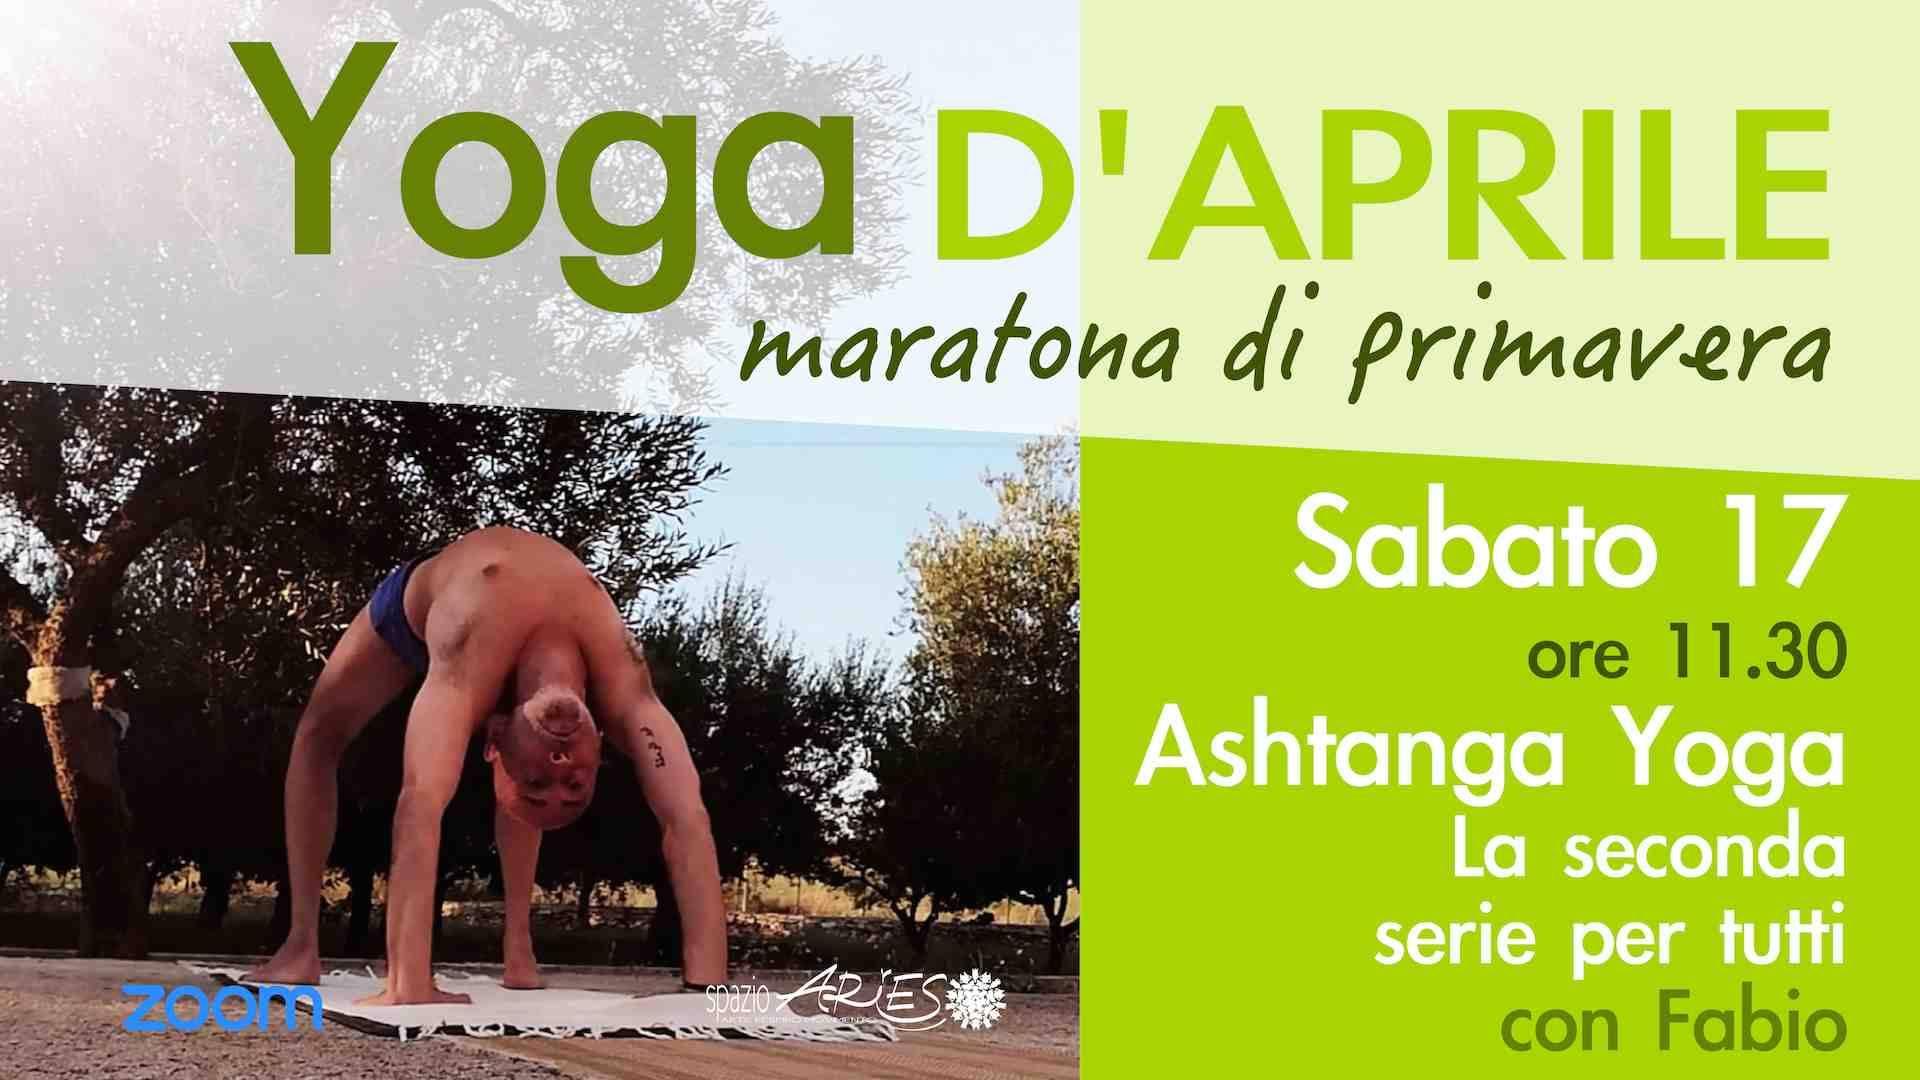 Ashtanga yoga online con Fabio